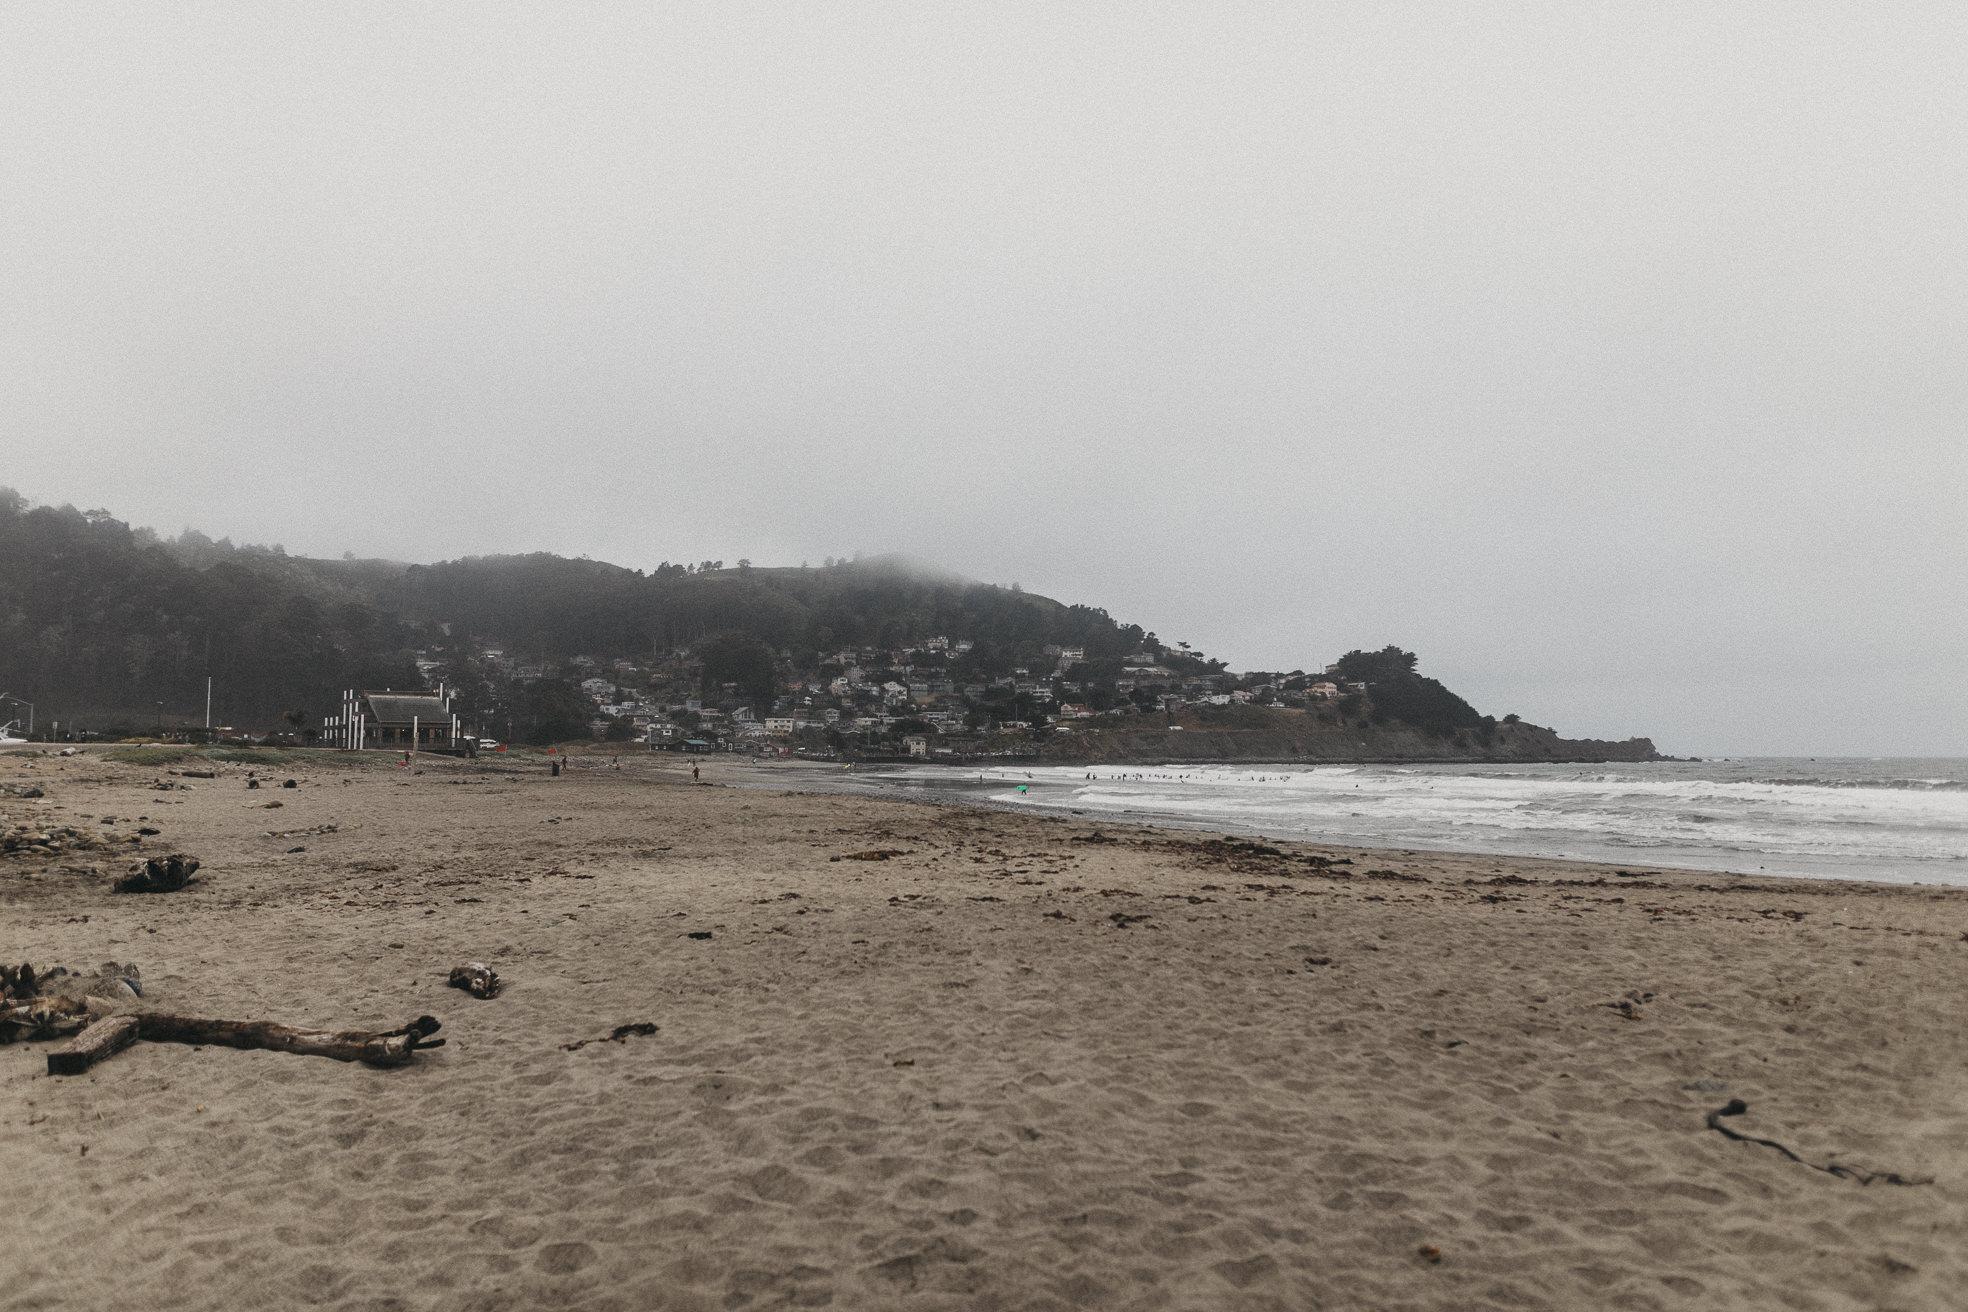 San-Francisco-BildervomLeben-9859